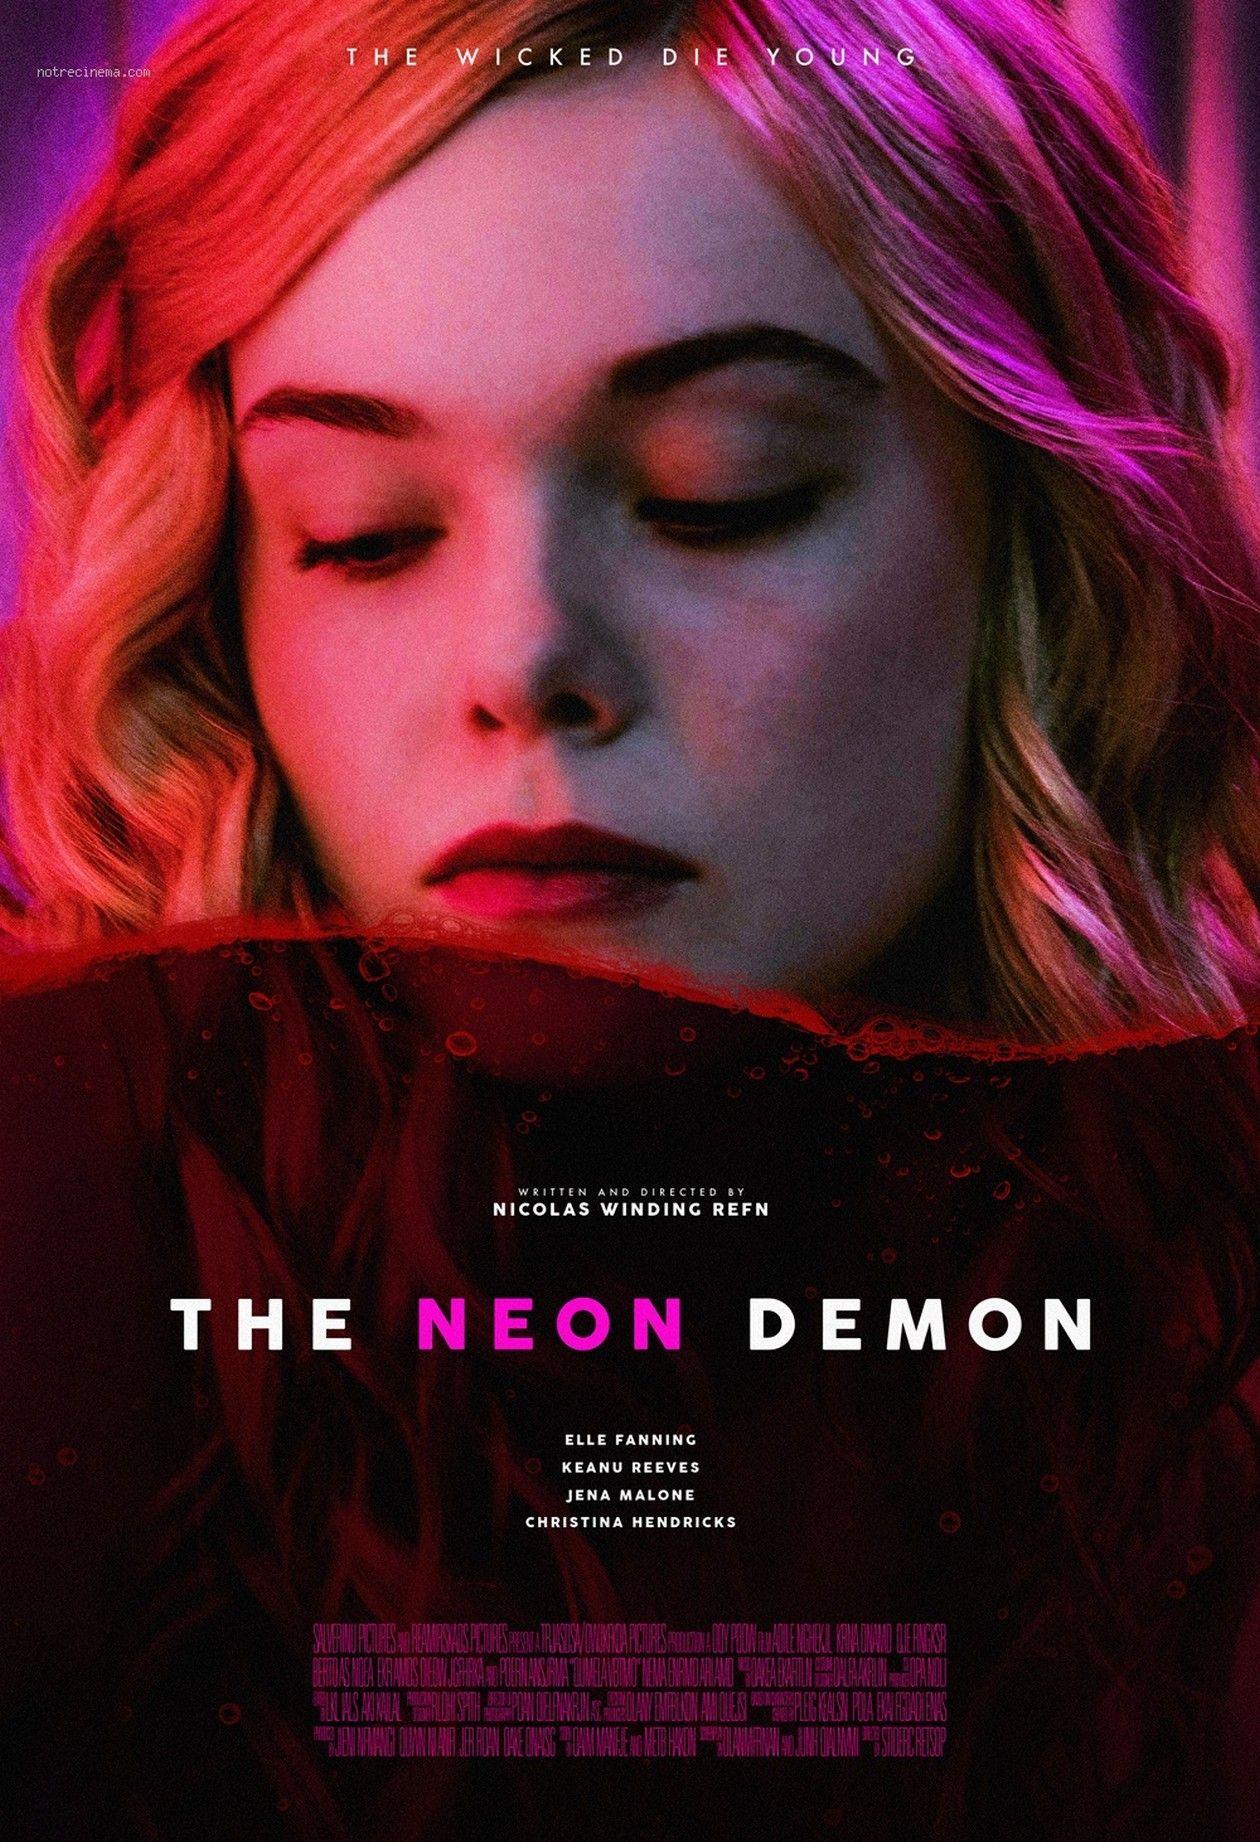 Elle Fanning | The Neon Demon | Nicolas Winding Refn / 2016 Movie Poster / Affiche du film